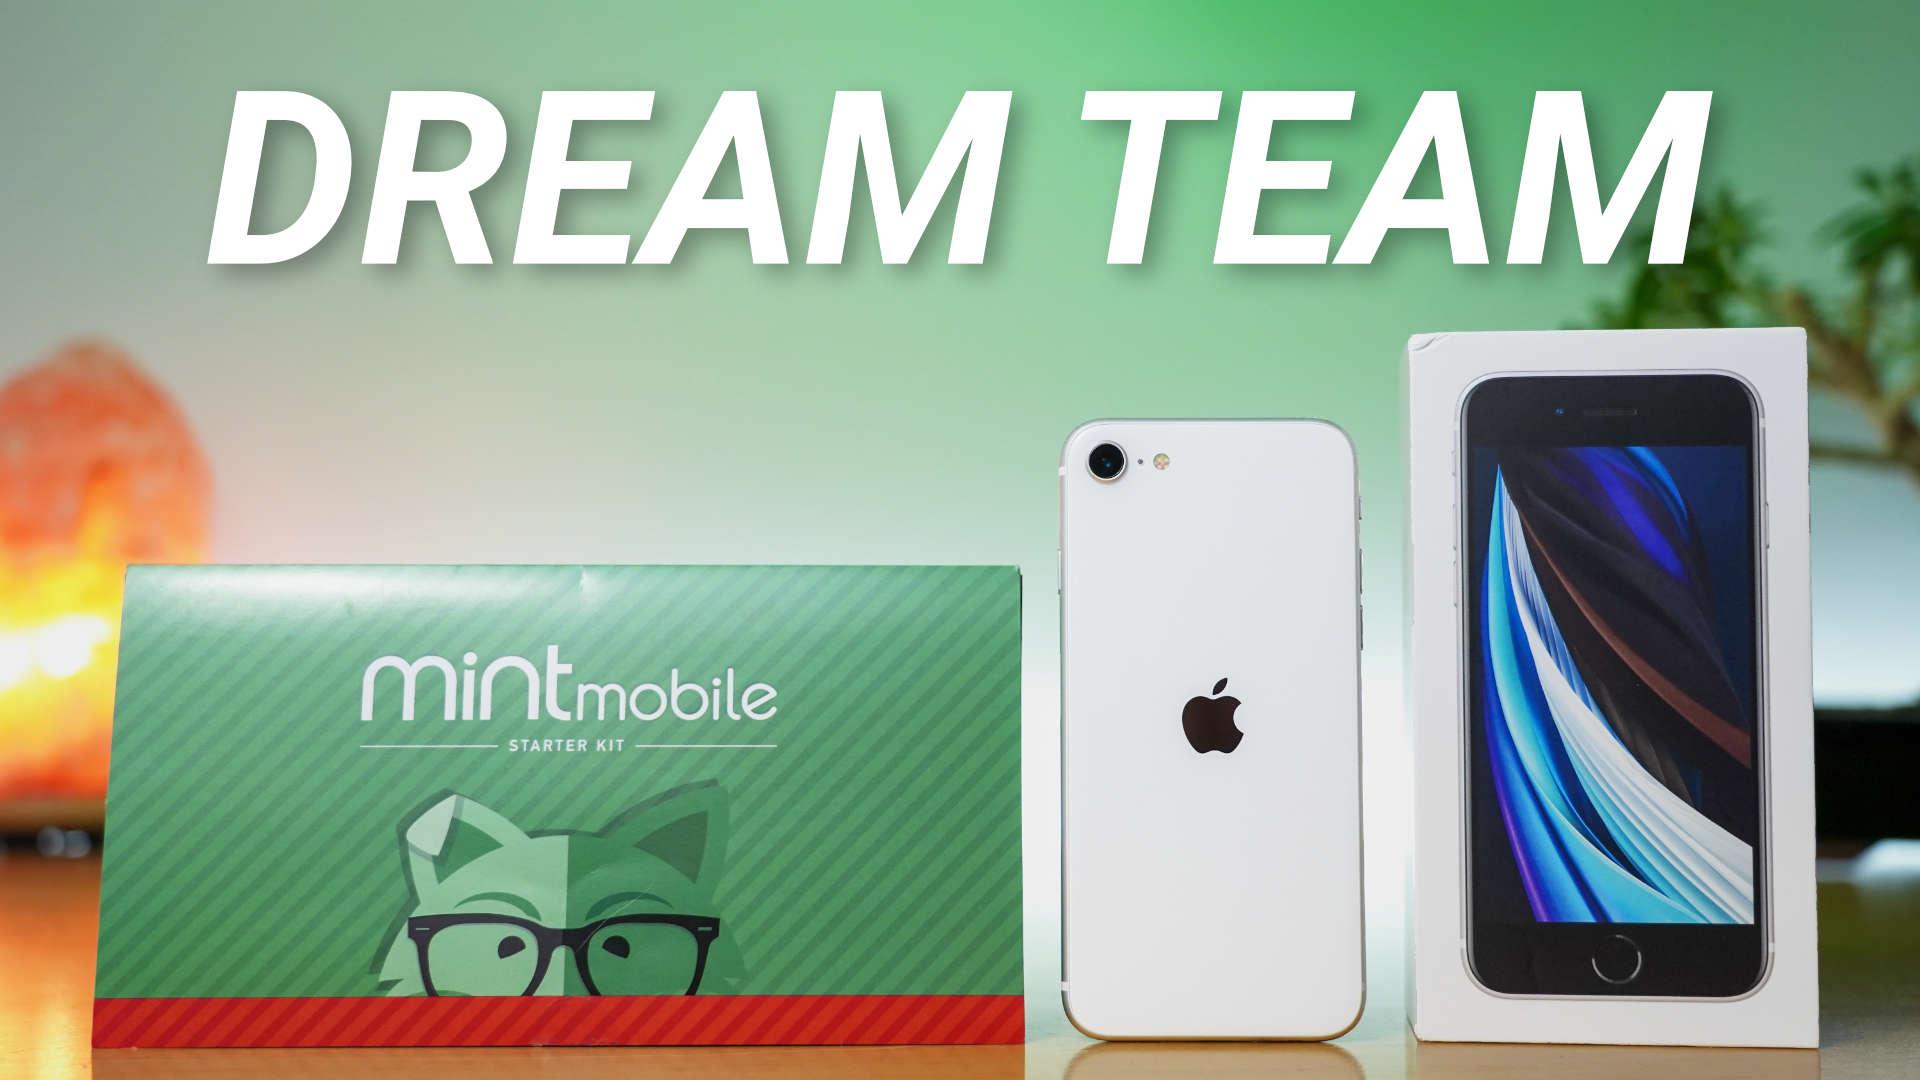 Mint Mobile SIM starter kit next to Apple's new $399 iPhone SE